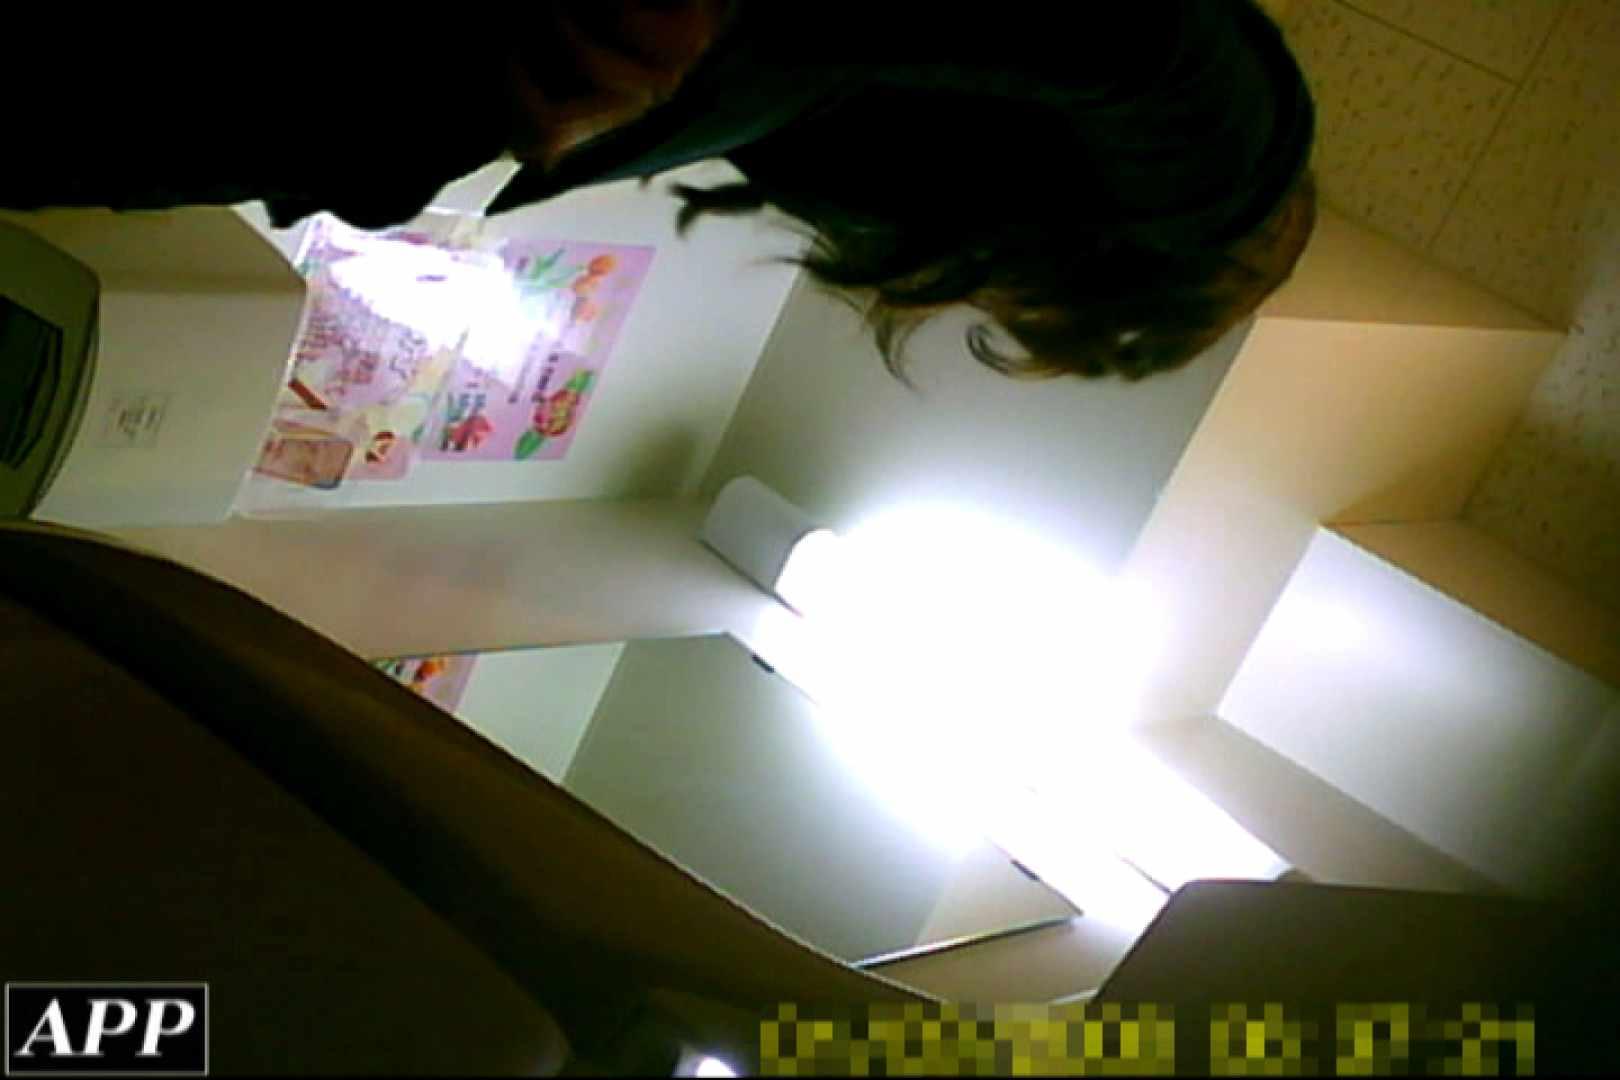 3視点洗面所 vol.121 OLハメ撮り  86Pix 10